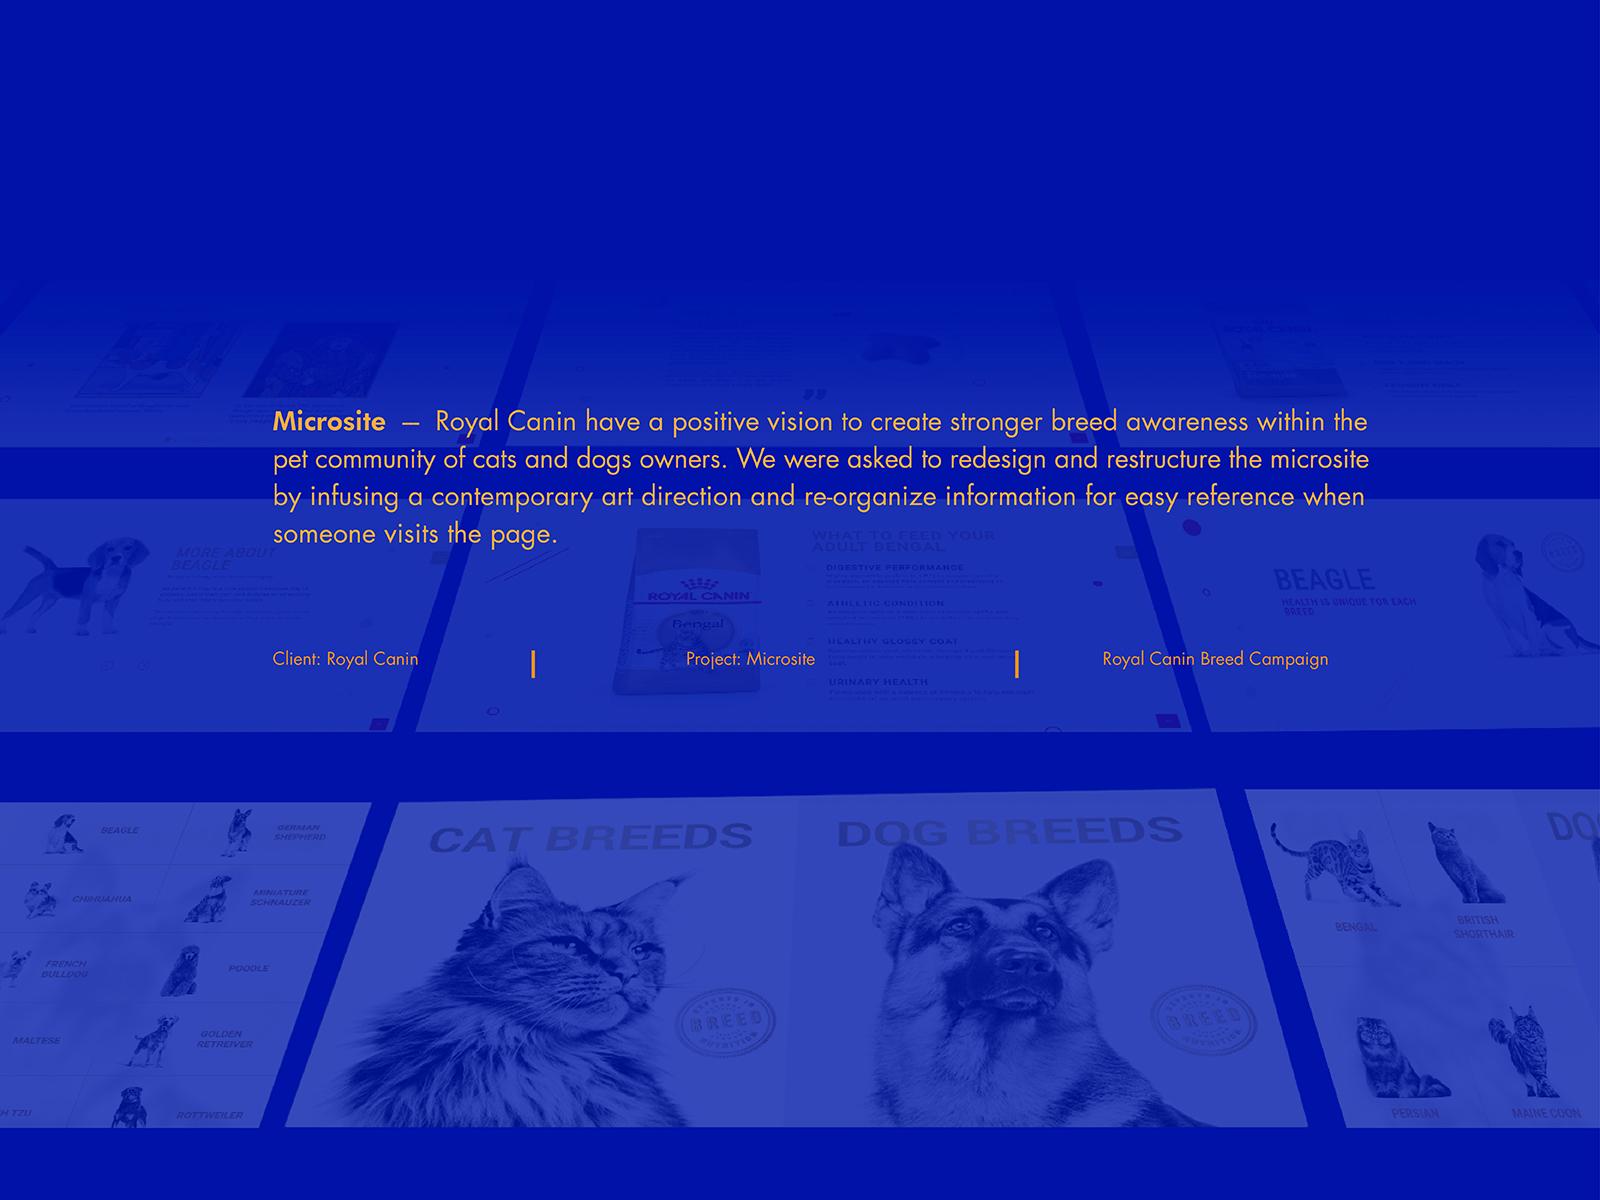 Royal Canin breed campaign microsite development and design brief